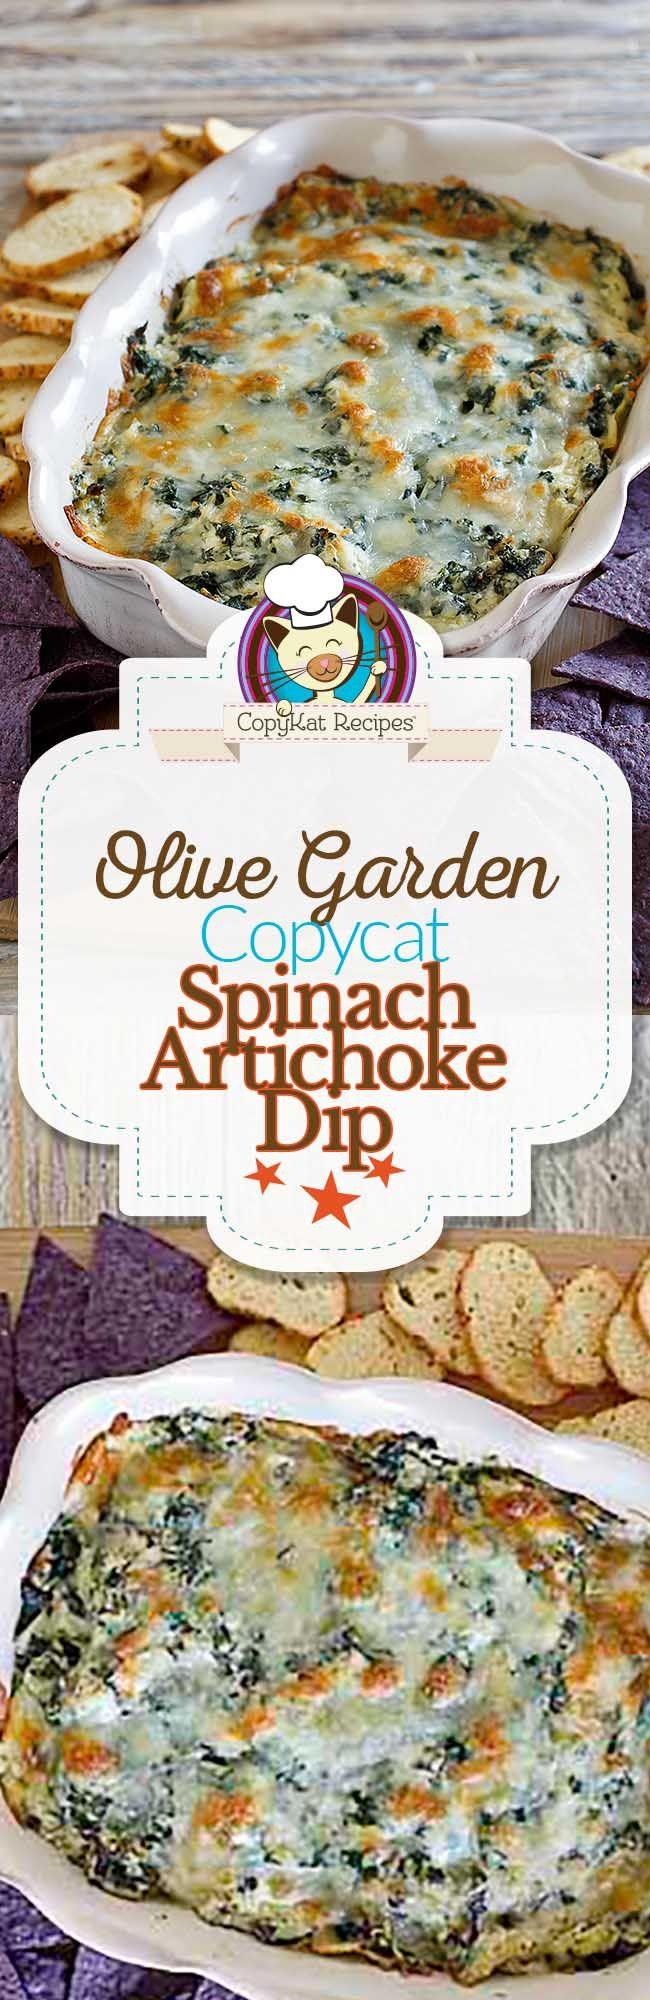 Best 20 olive garden soups ideas on pinterest cooking - Spinach artichoke dip olive garden ...